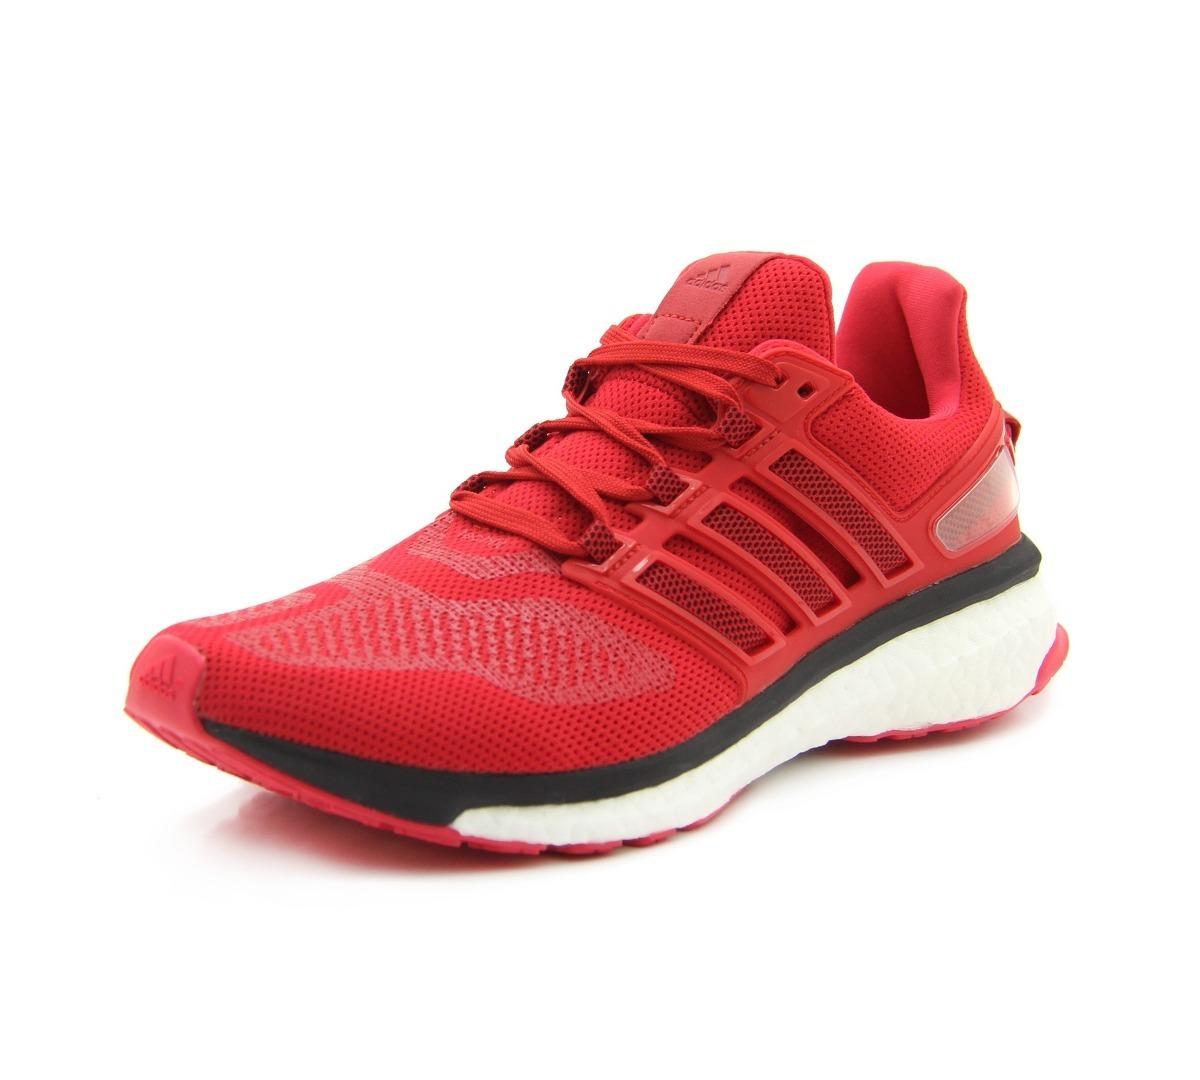 online store 9111b 99ac1 tenis adidas hombre rojos tranning energy boost 3 m aq5961. Cargando zoom.